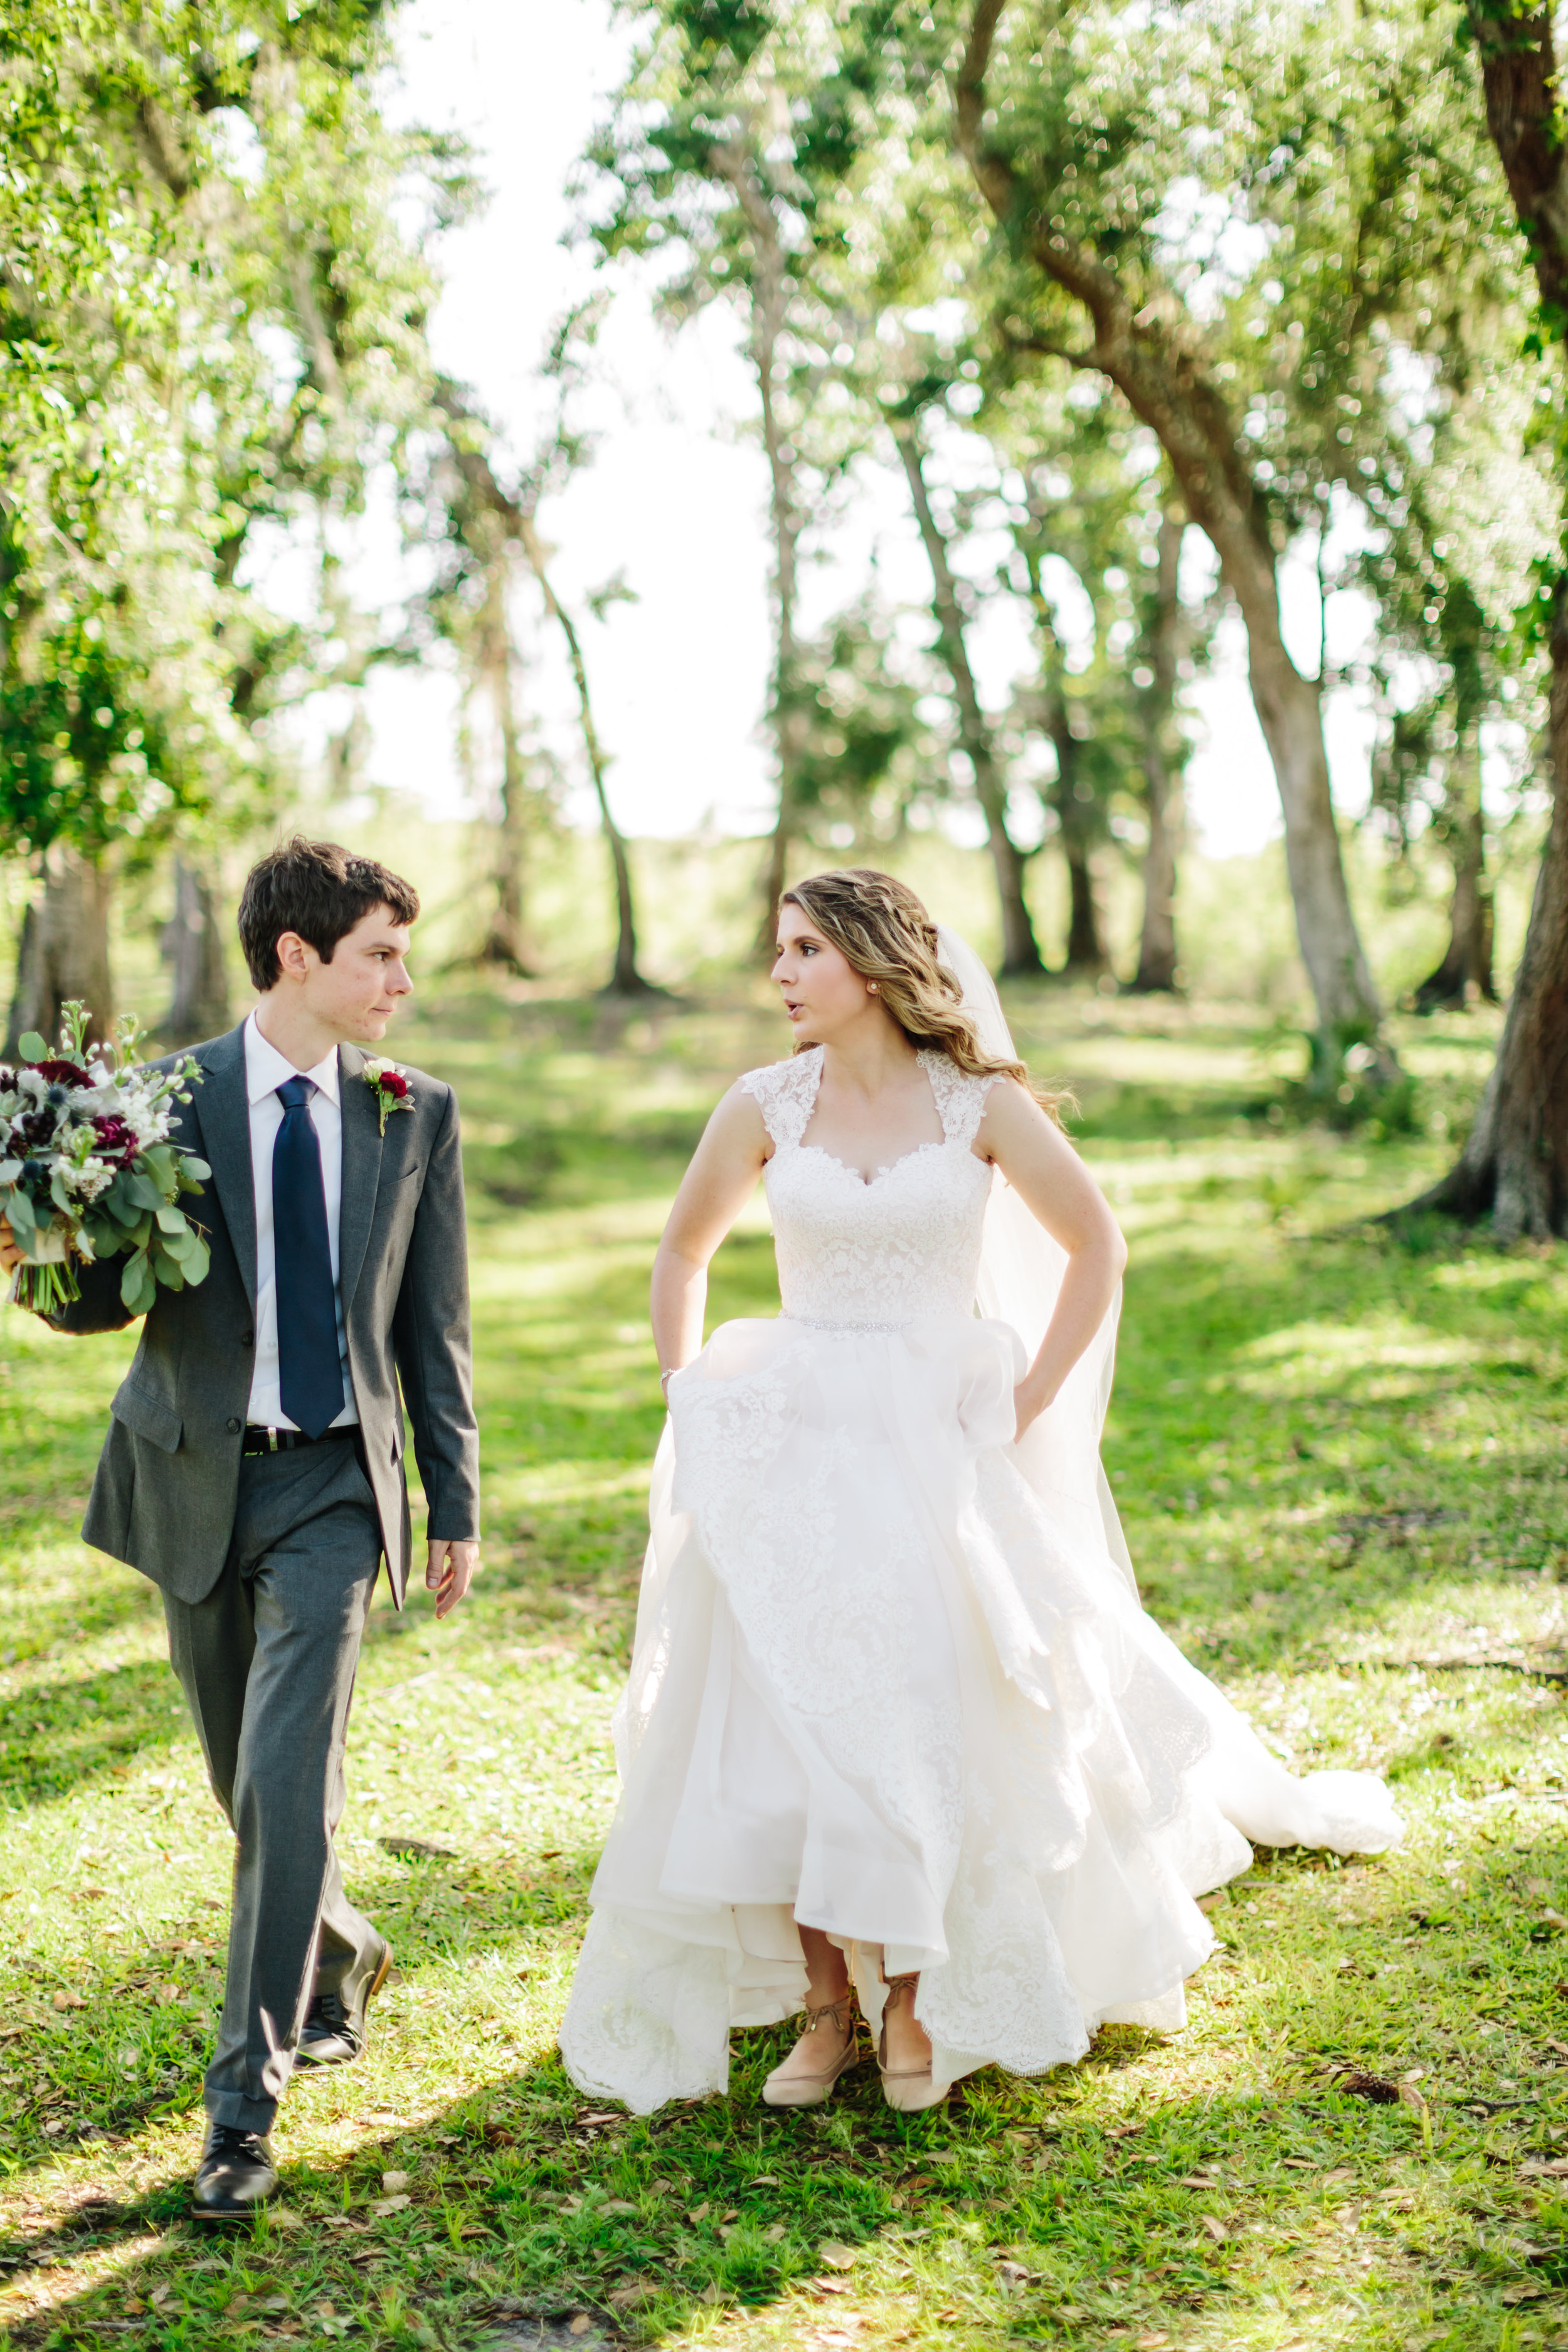 2018.04.14 Zak and Jamisyn Unrue Black Willow Barn Wedding Finals-590.jpg